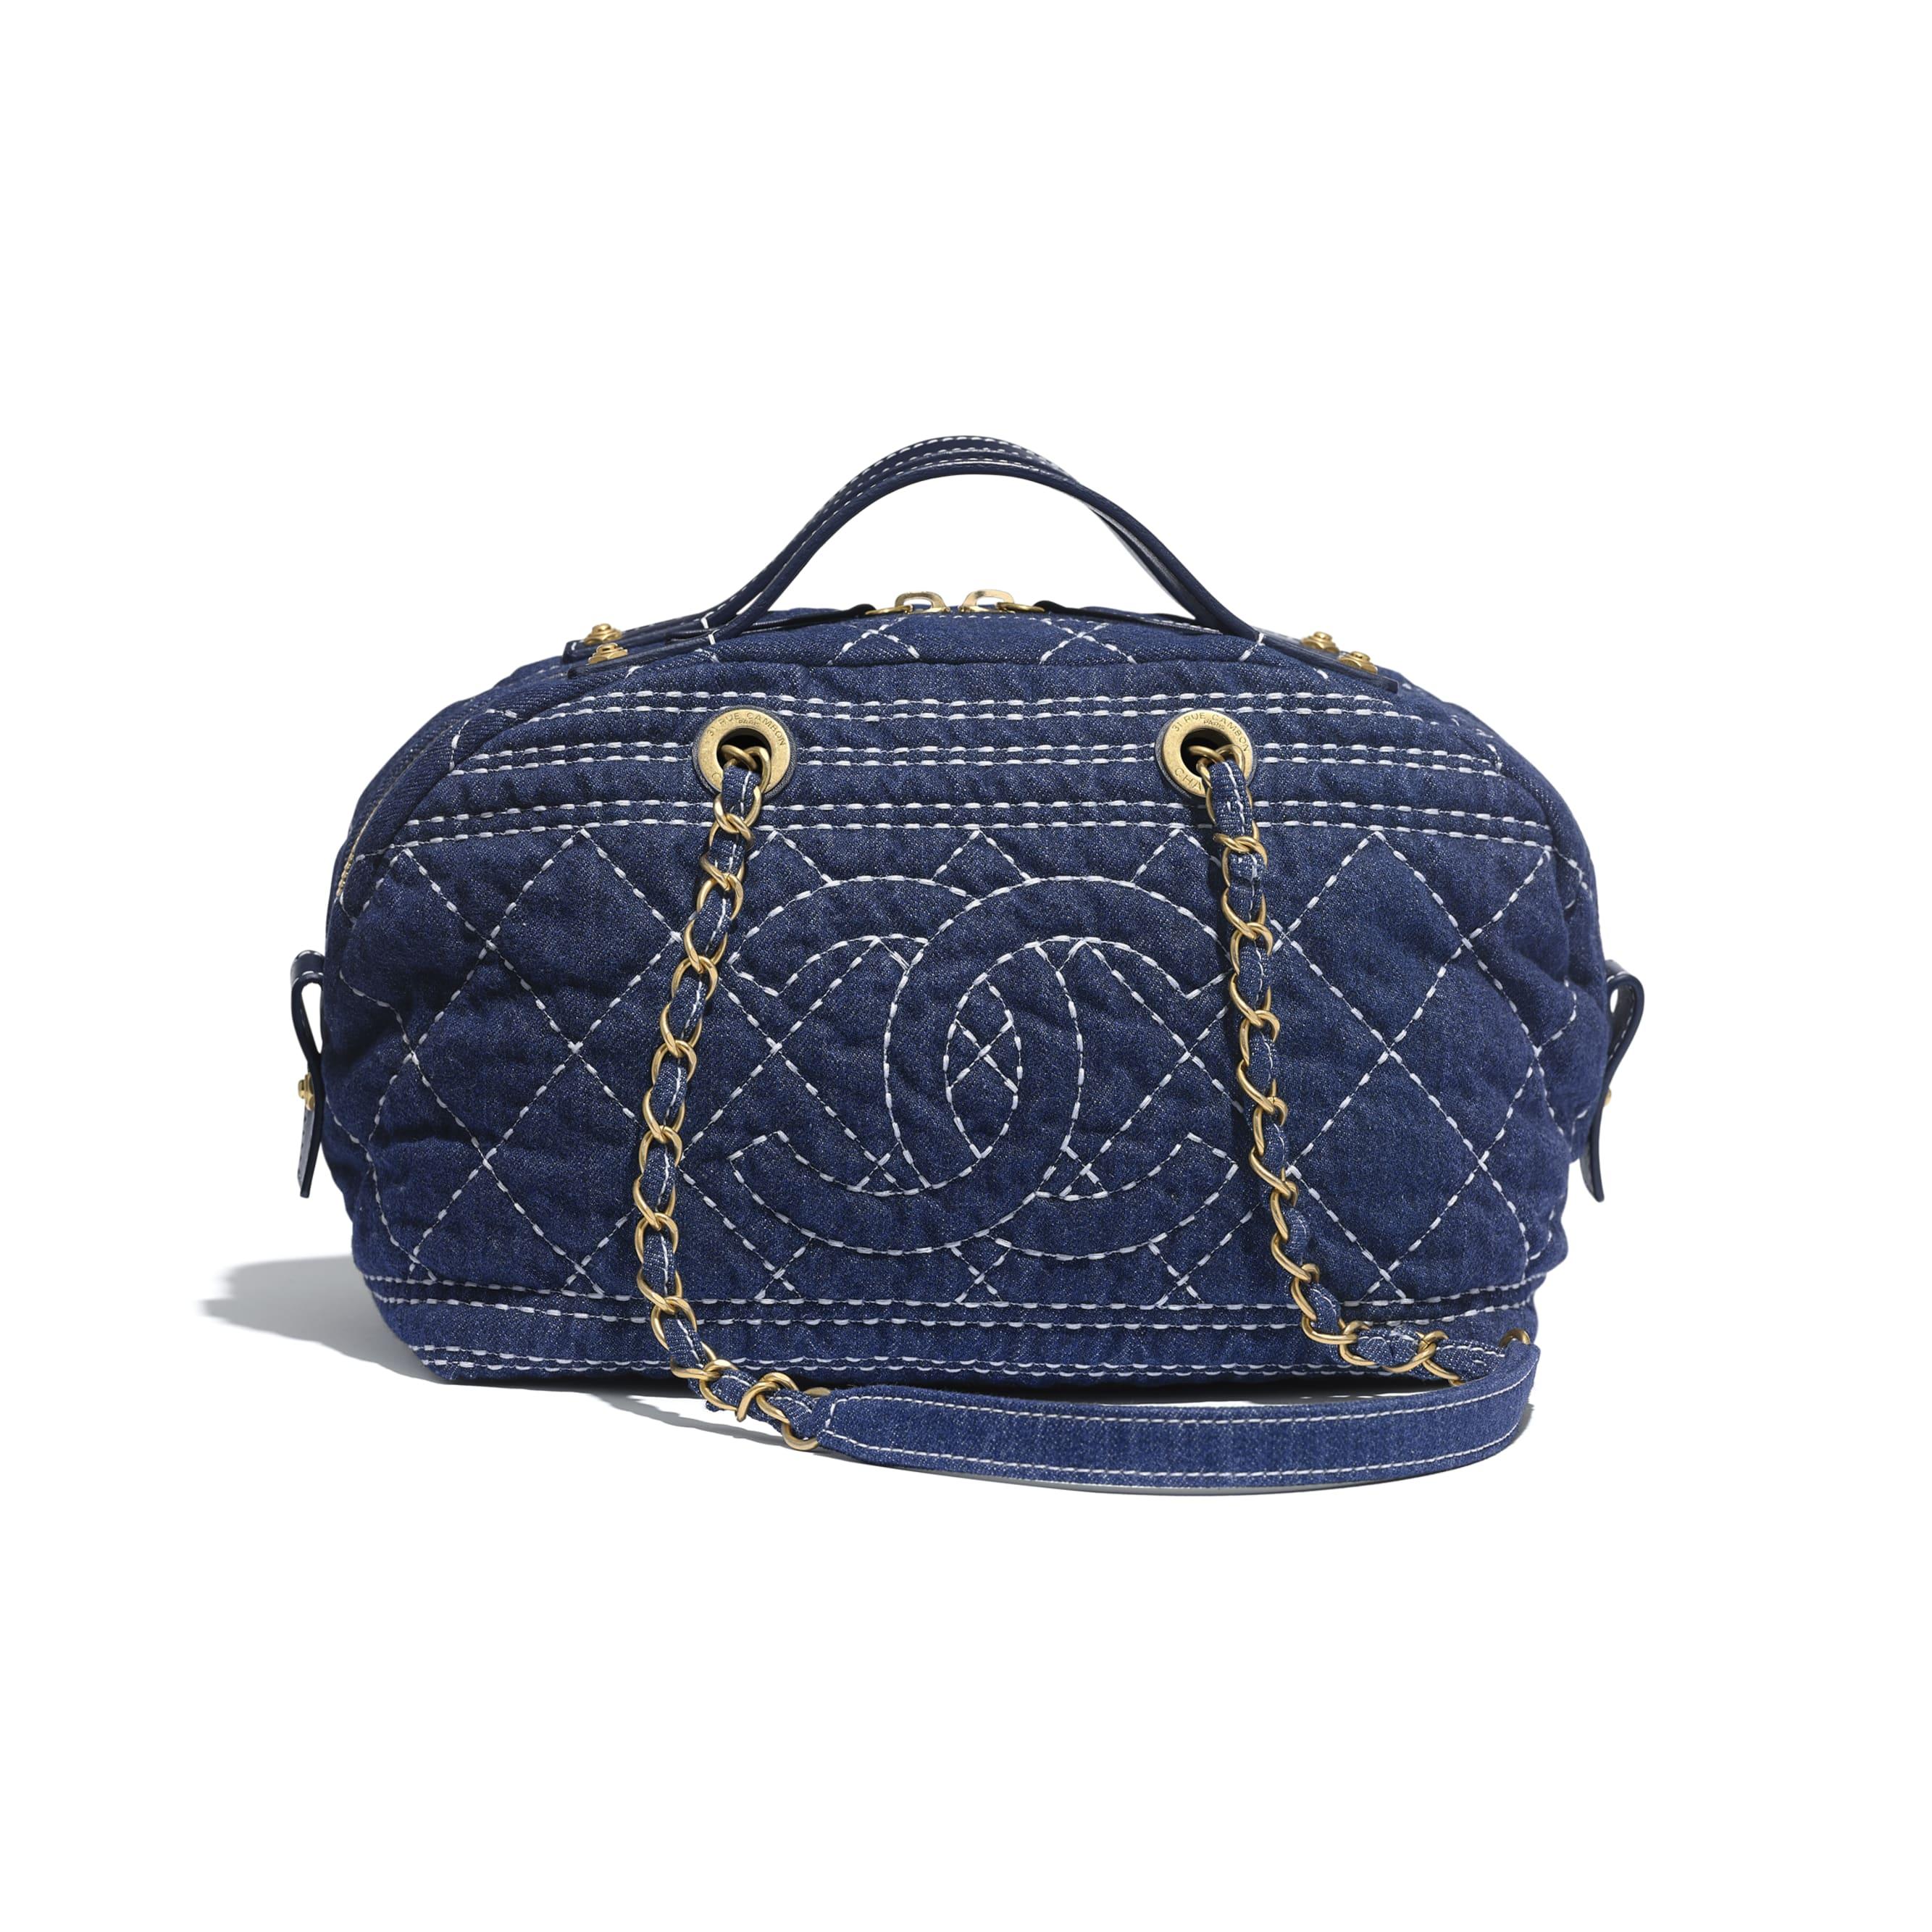 Bowling Bag - Blue - Denim & Gold-Tone Metal - CHANEL - Default view - see standard sized version